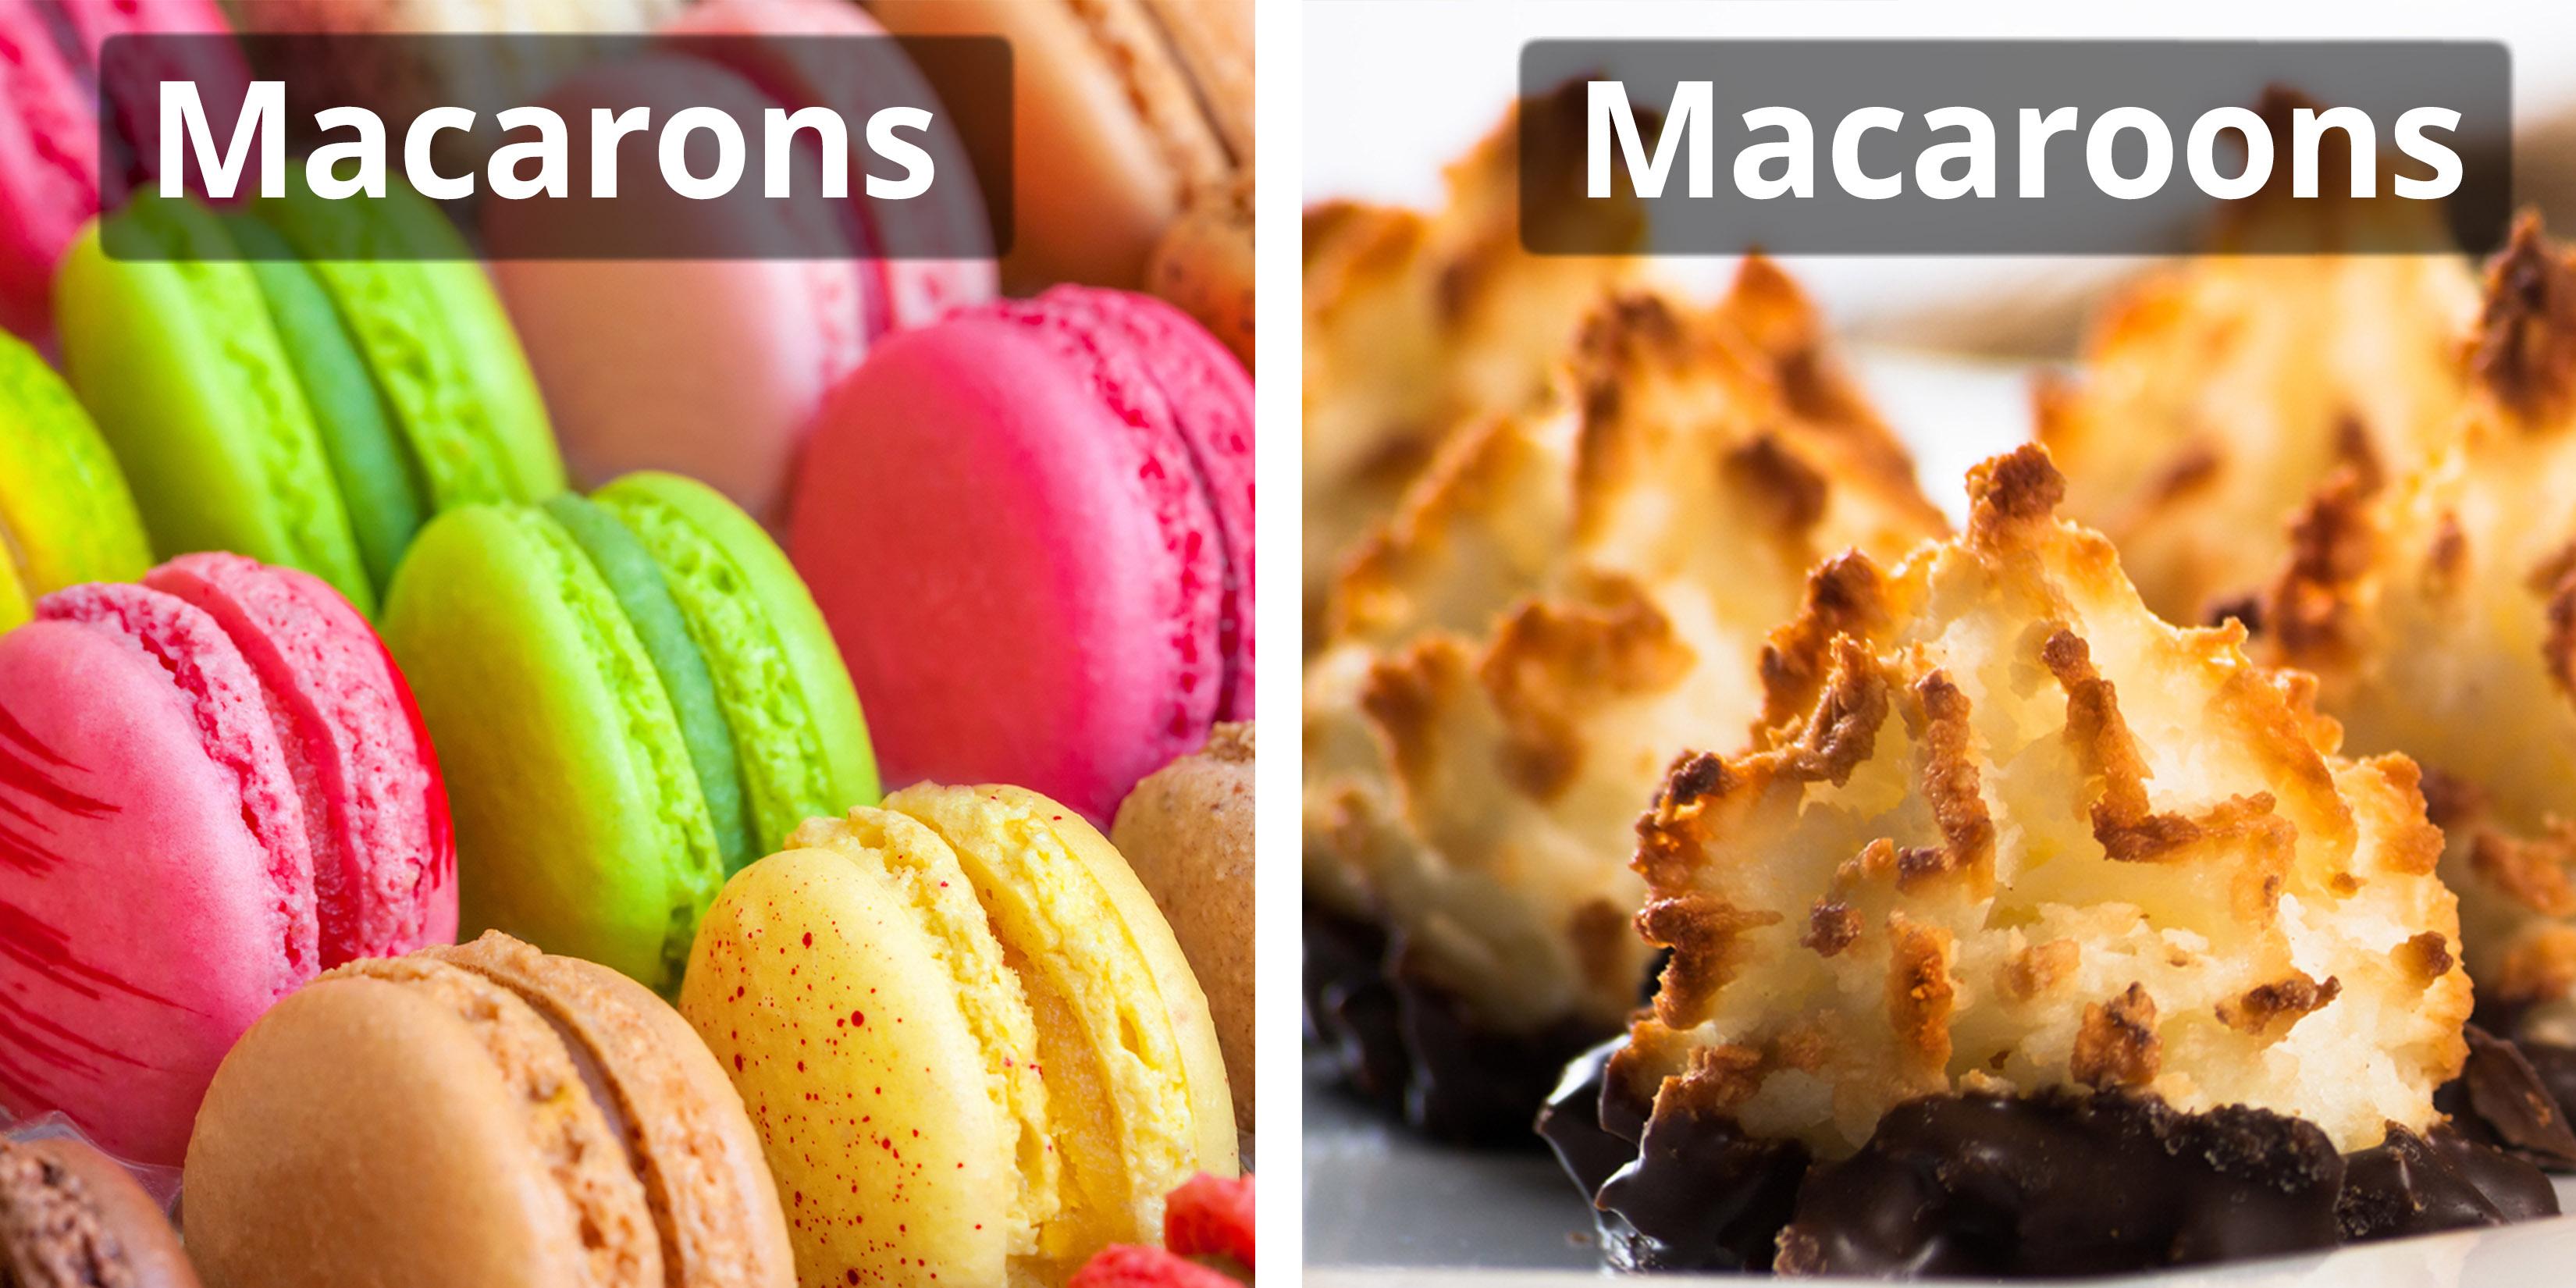 macarons v macaroons